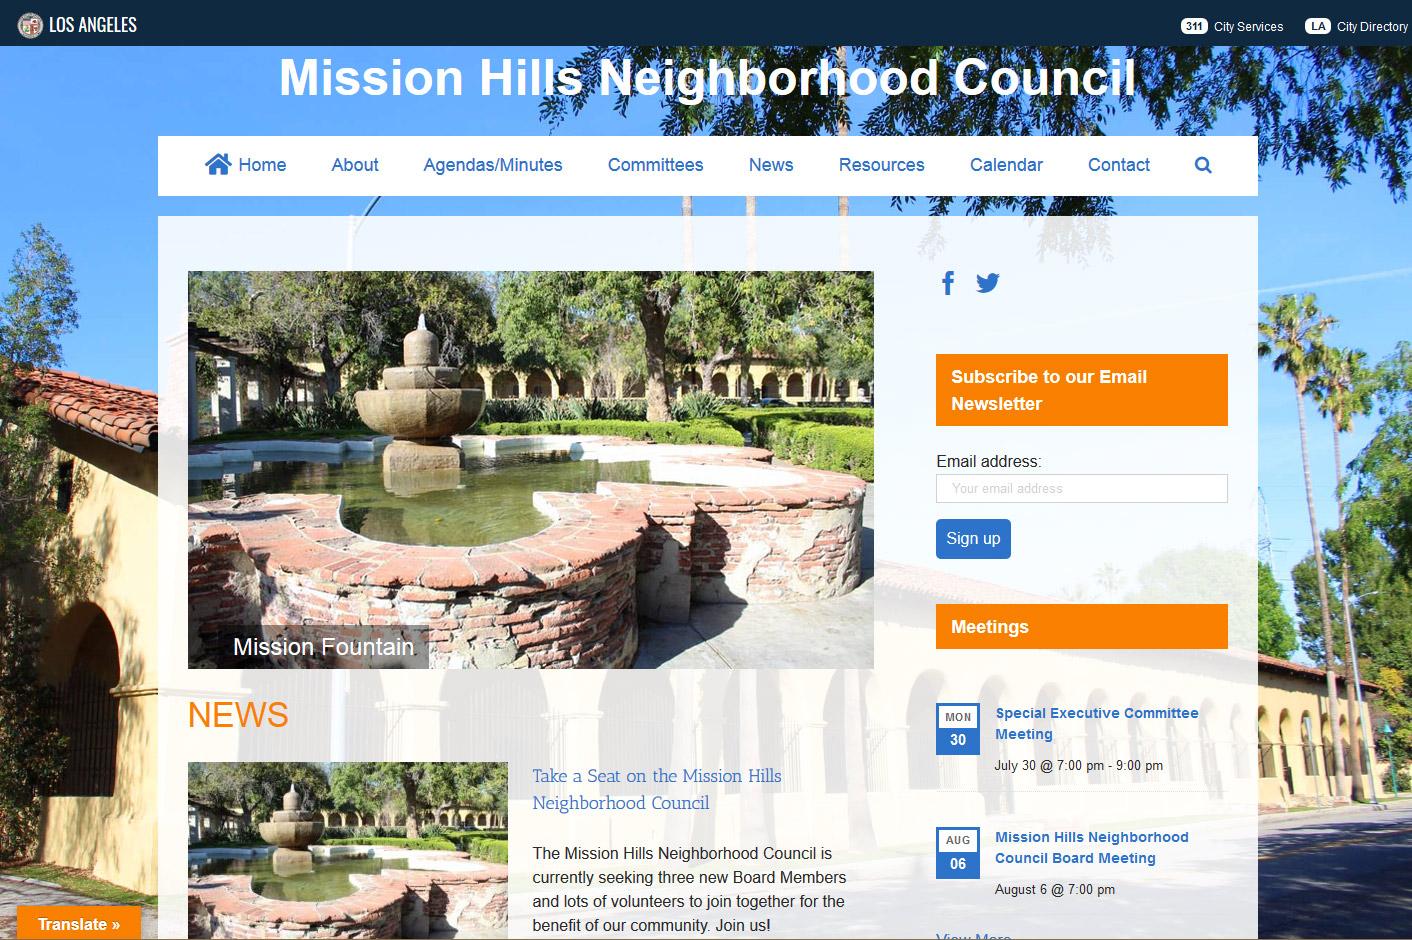 Mission Hills Neighborhood Council Website